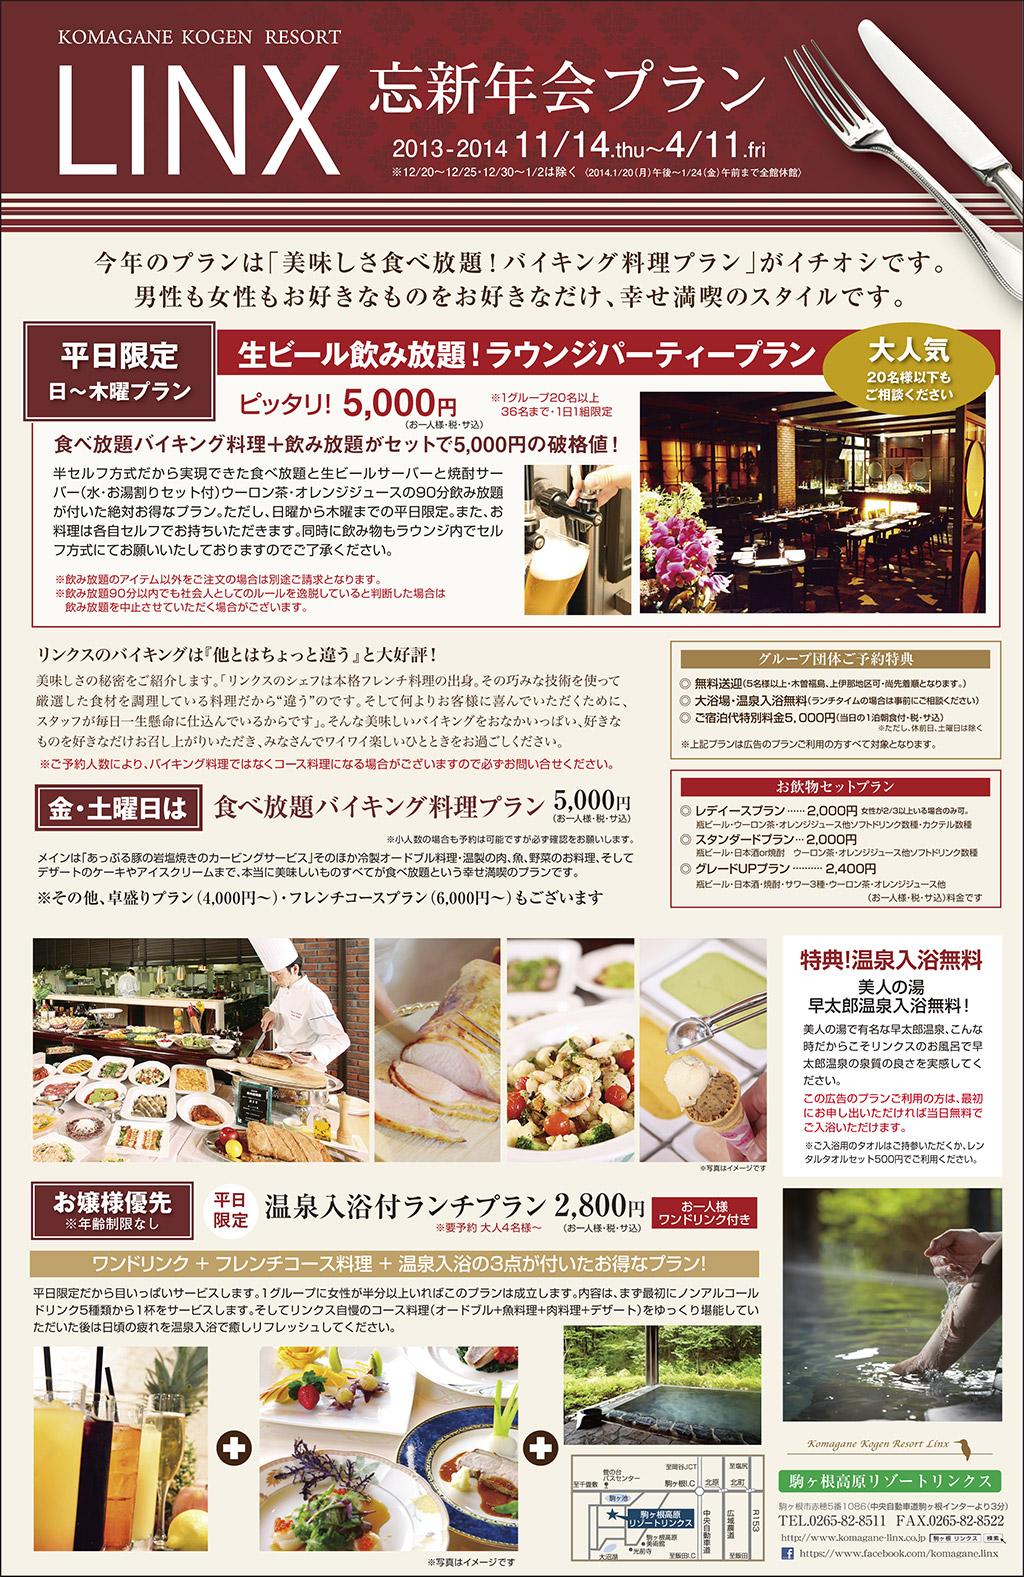 http://www.komagane-linx.co.jp/blogimages/hotel_201301127_kamiina02.jpg